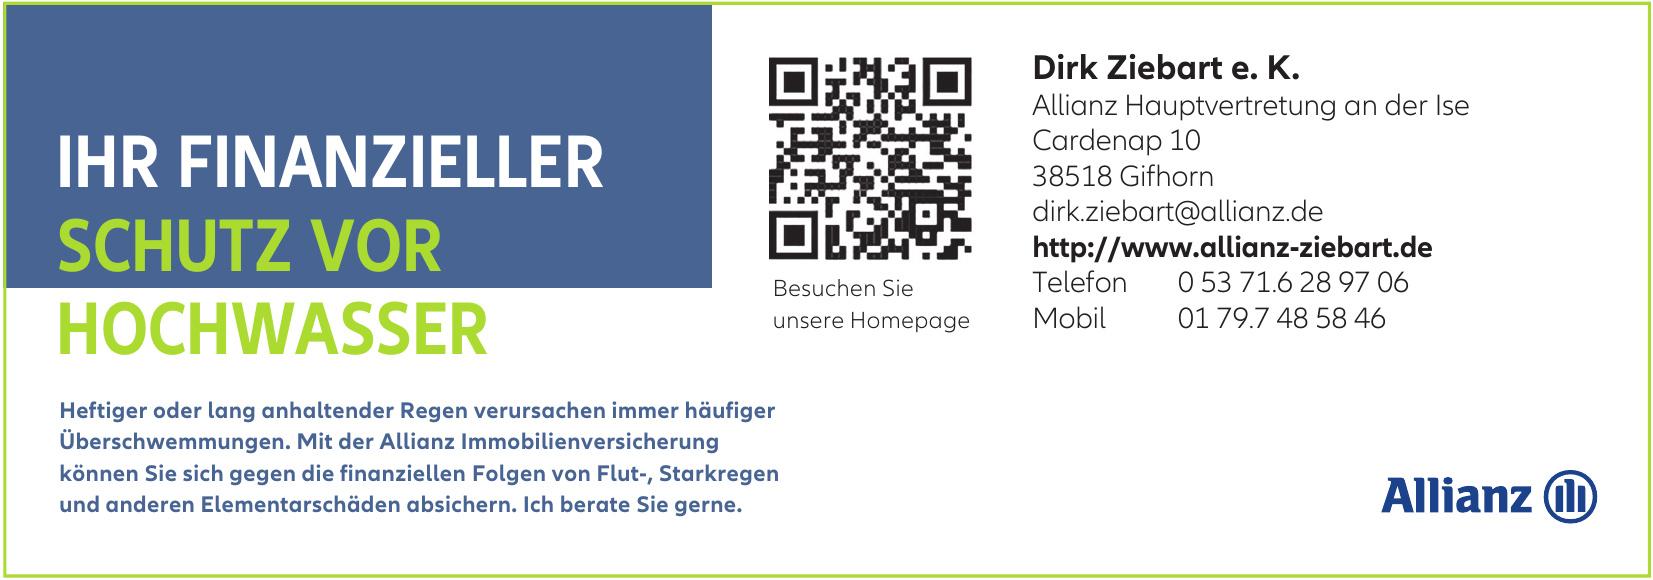 Dirk Ziebart e. K. - Allianz Hauptvertretung an der Ise